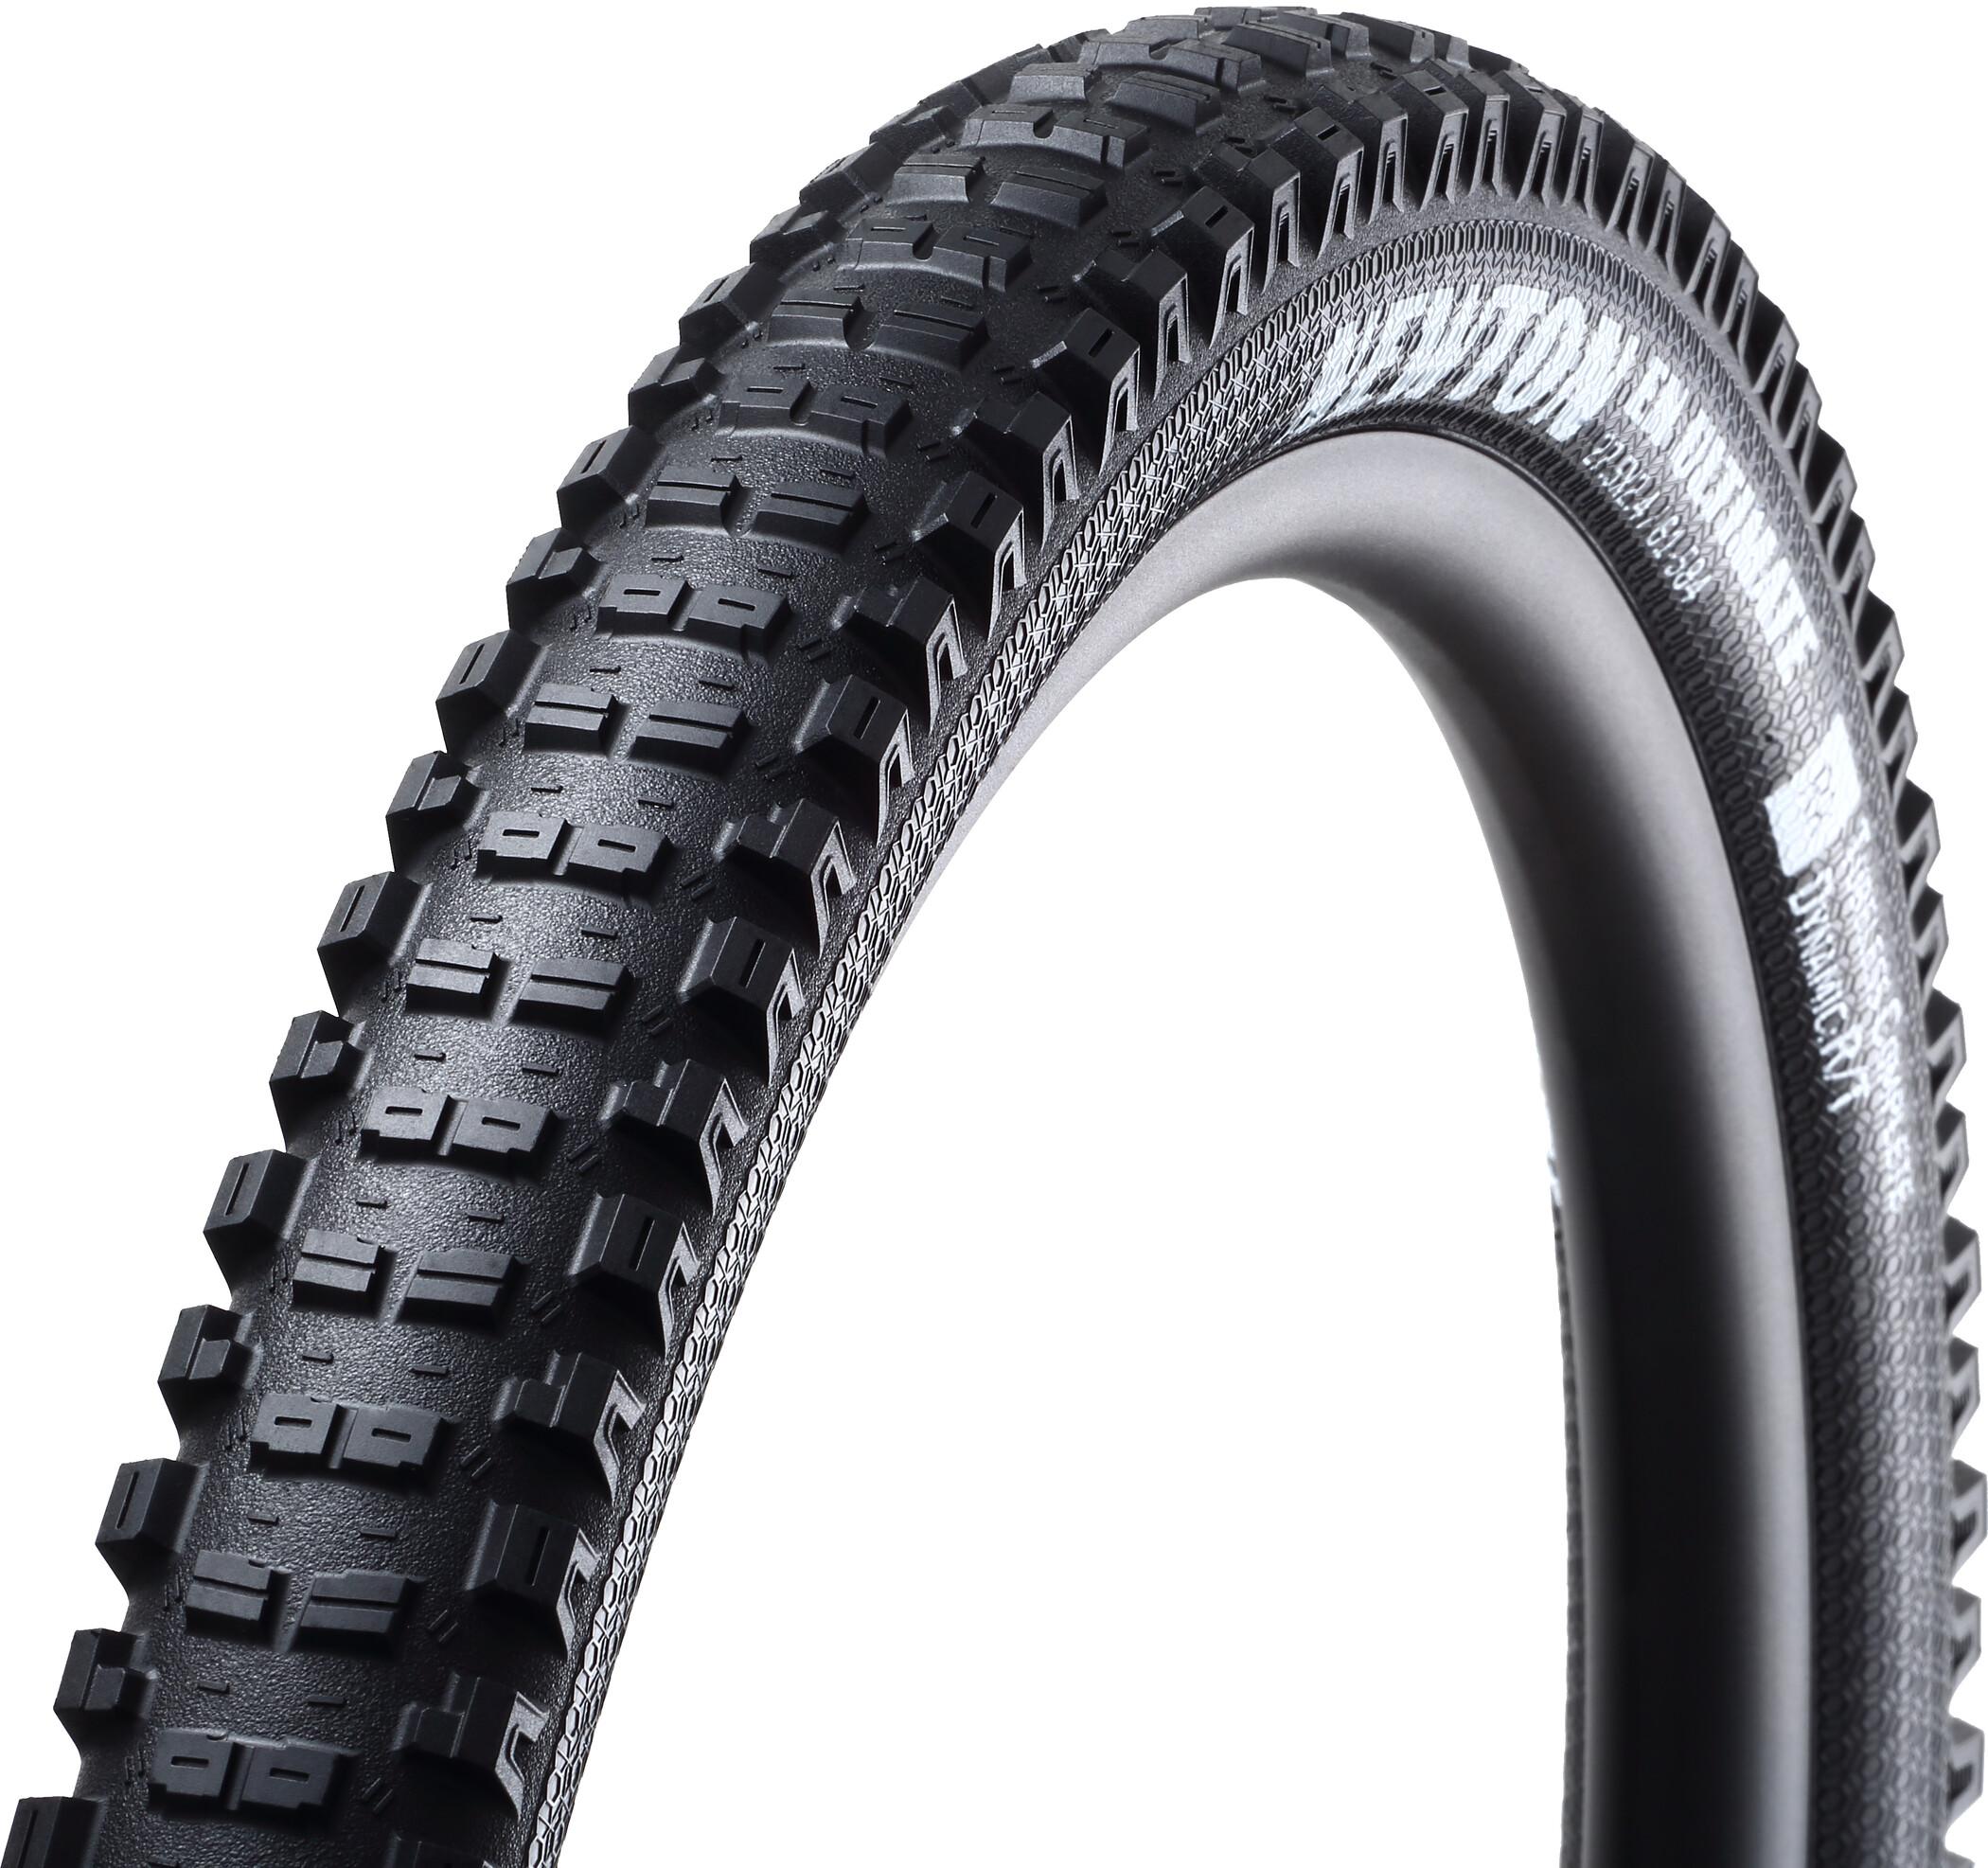 Goodyear Newton EN Ultimate Foldedæk 66-622 Tubeless Complete Dynamic R/T e25, black (2019)   Tyres